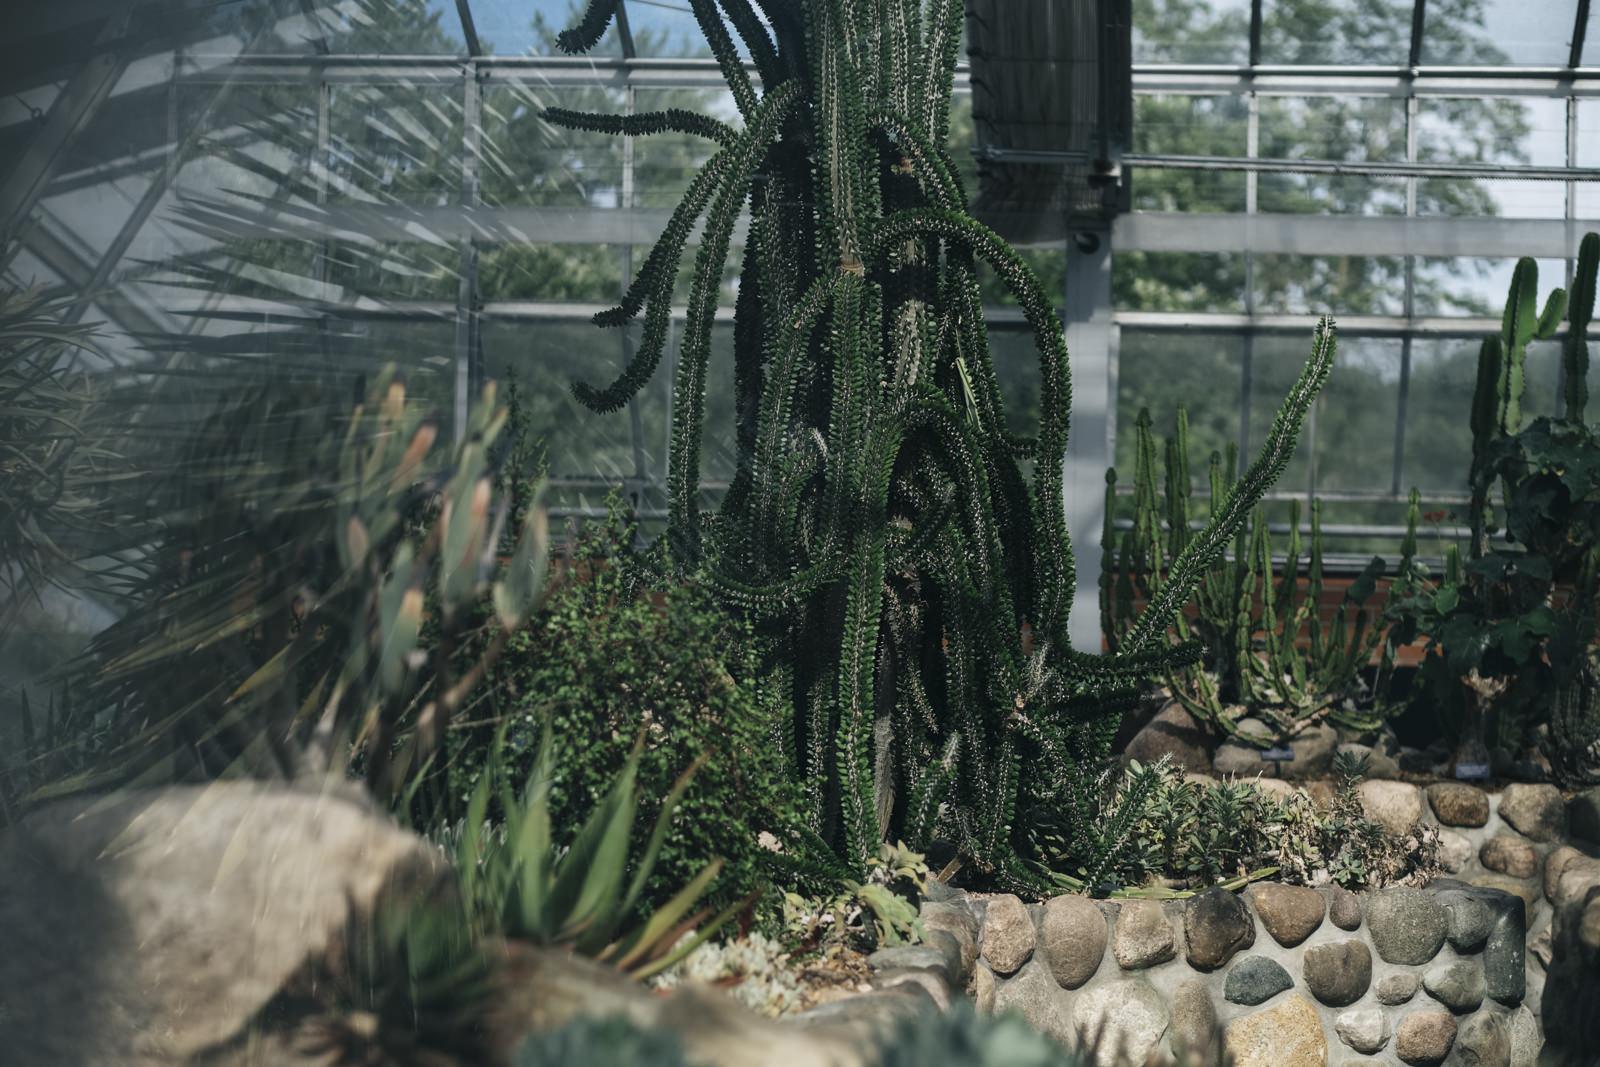 Cactus at Matthaei Botanical Gardens.